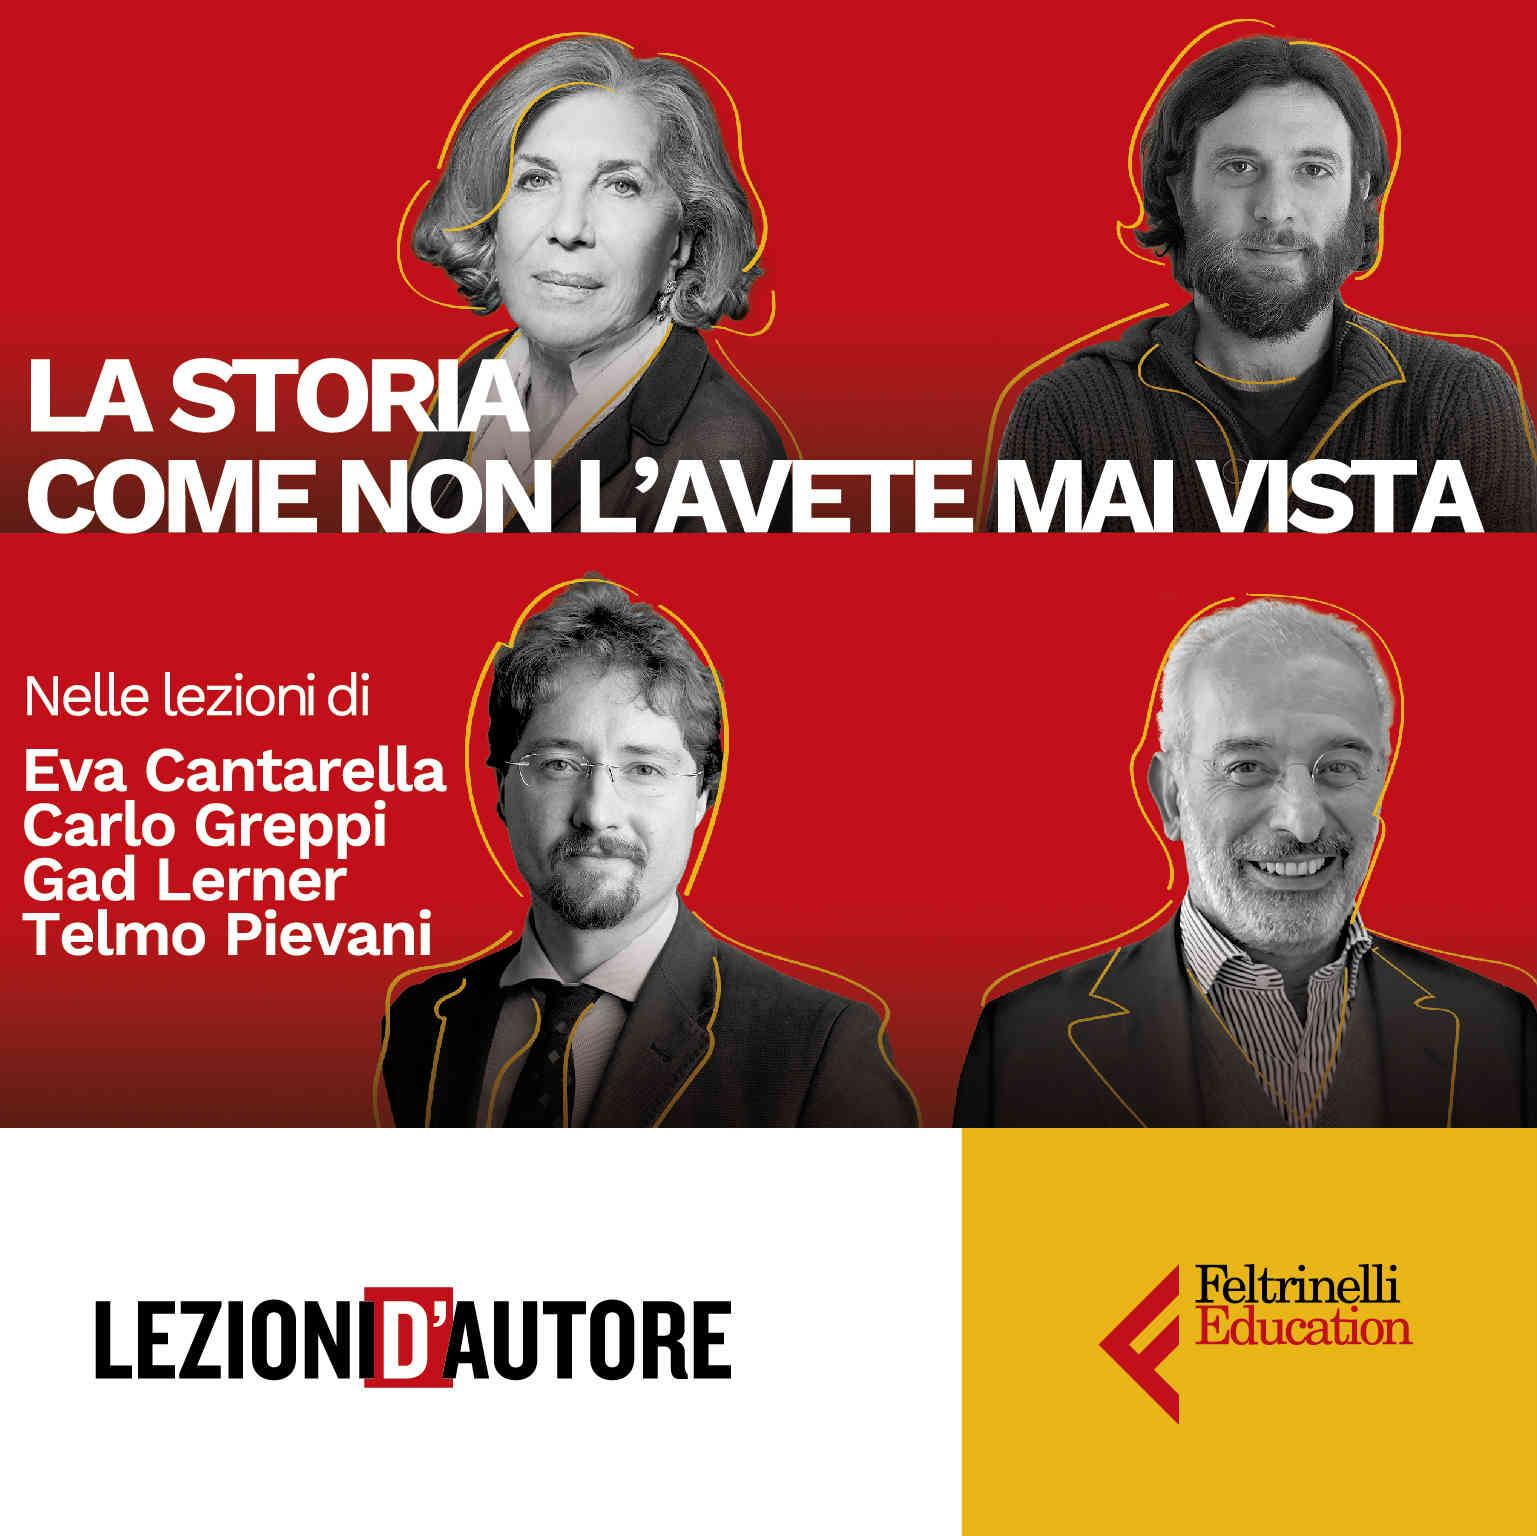 storia feltrinelli education